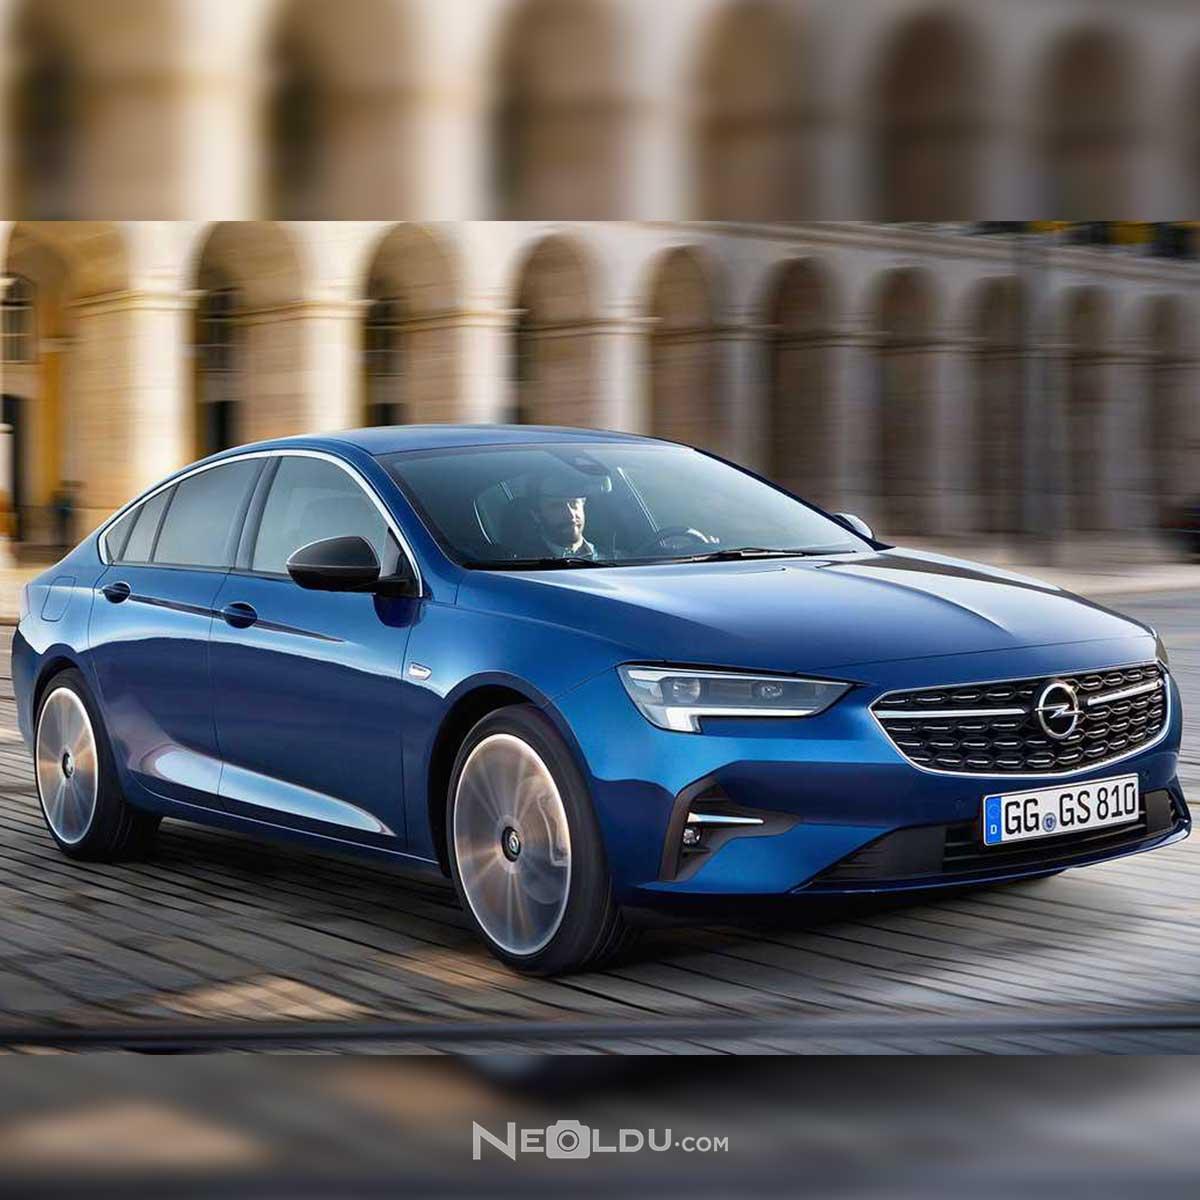 Opel Insignia Grand Sport 2020 Teknik Özellikleri